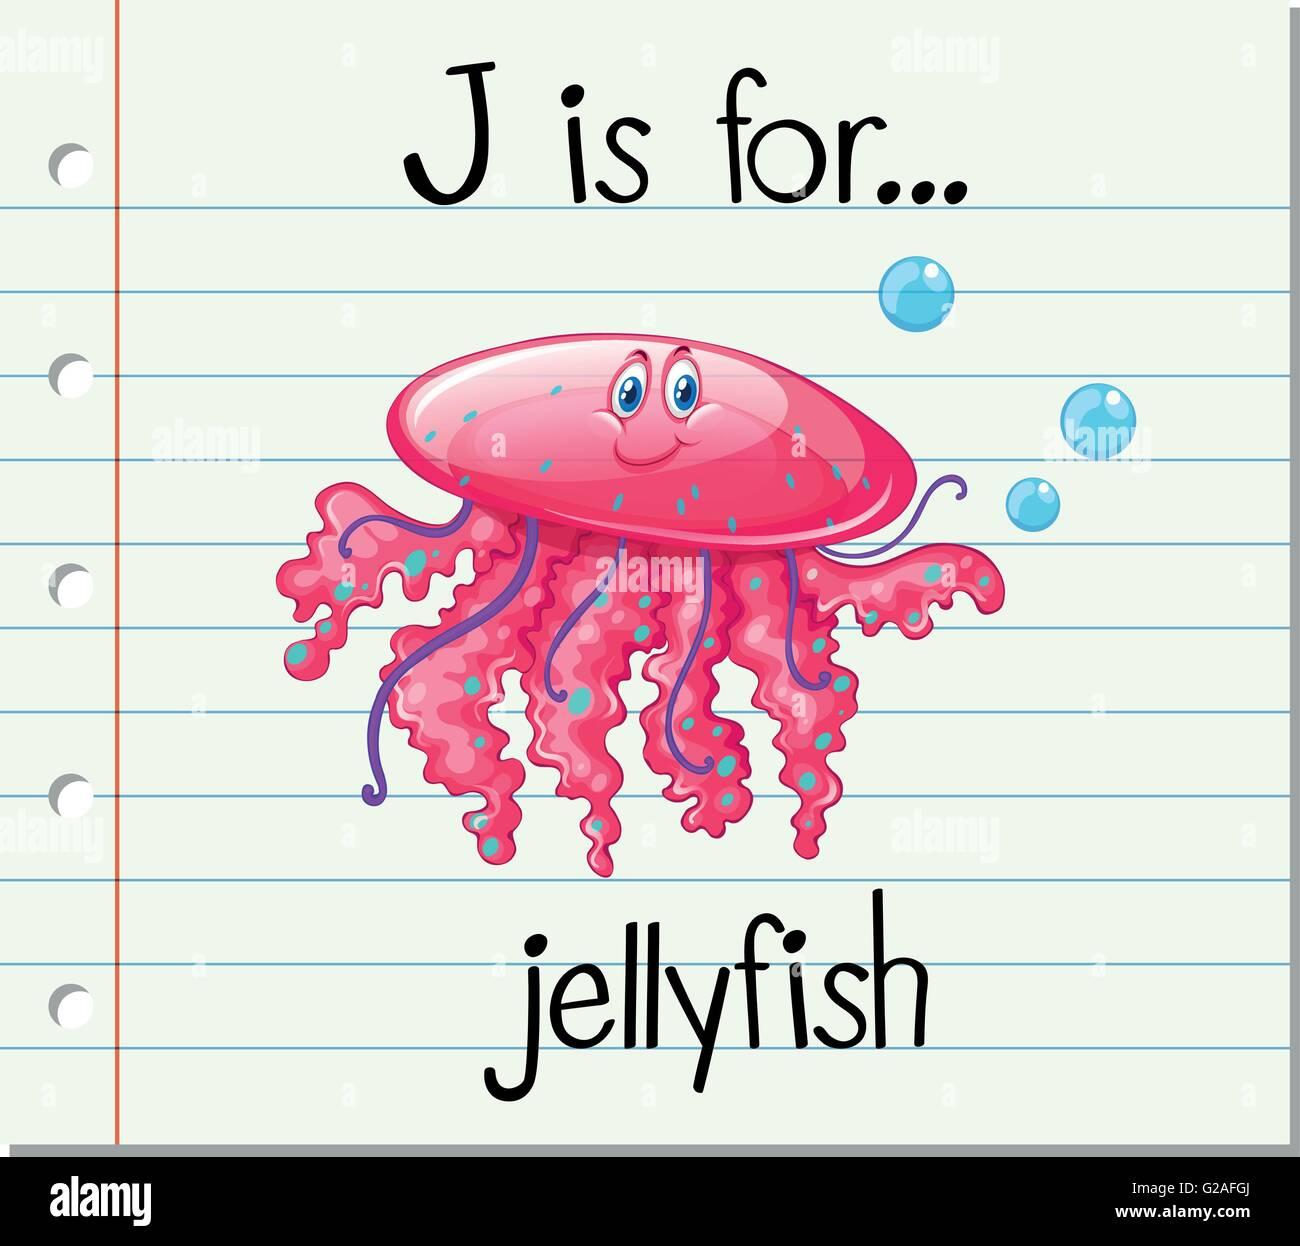 Flashcard Letter J Is For Jellyfish Illustration Stock Vector Art Amp Illustration Vector Image